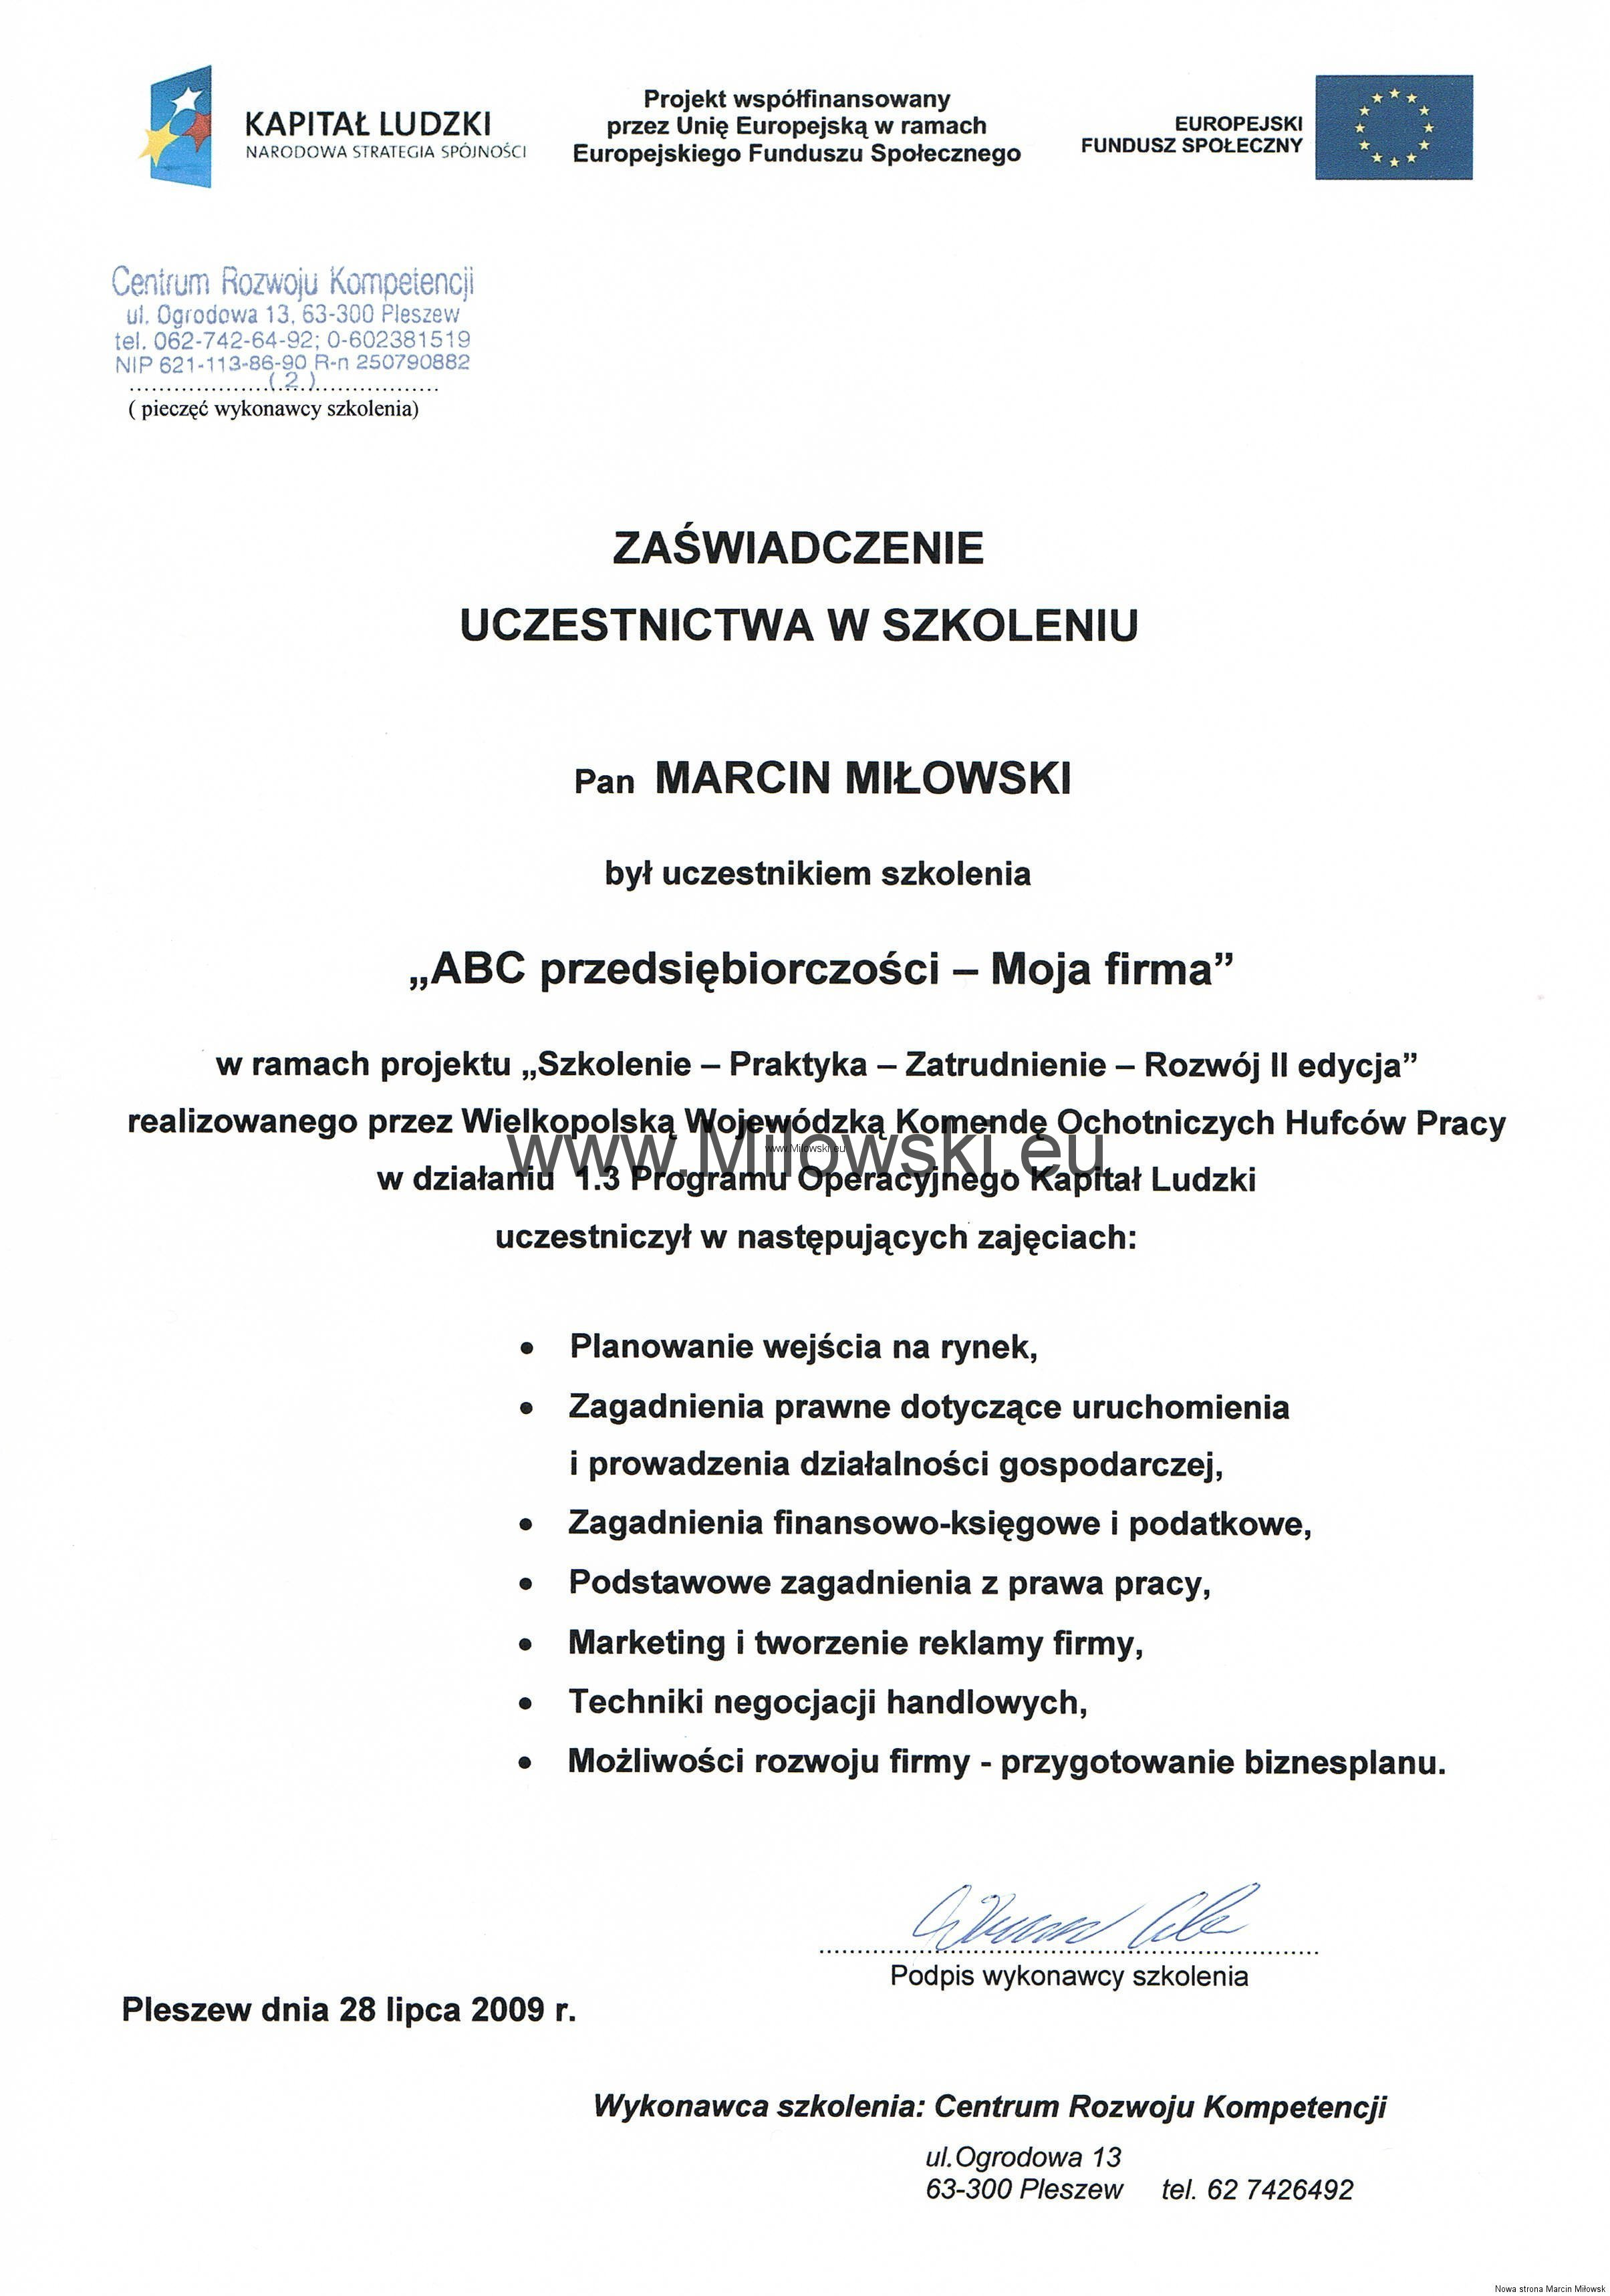 ccf20130112_00015